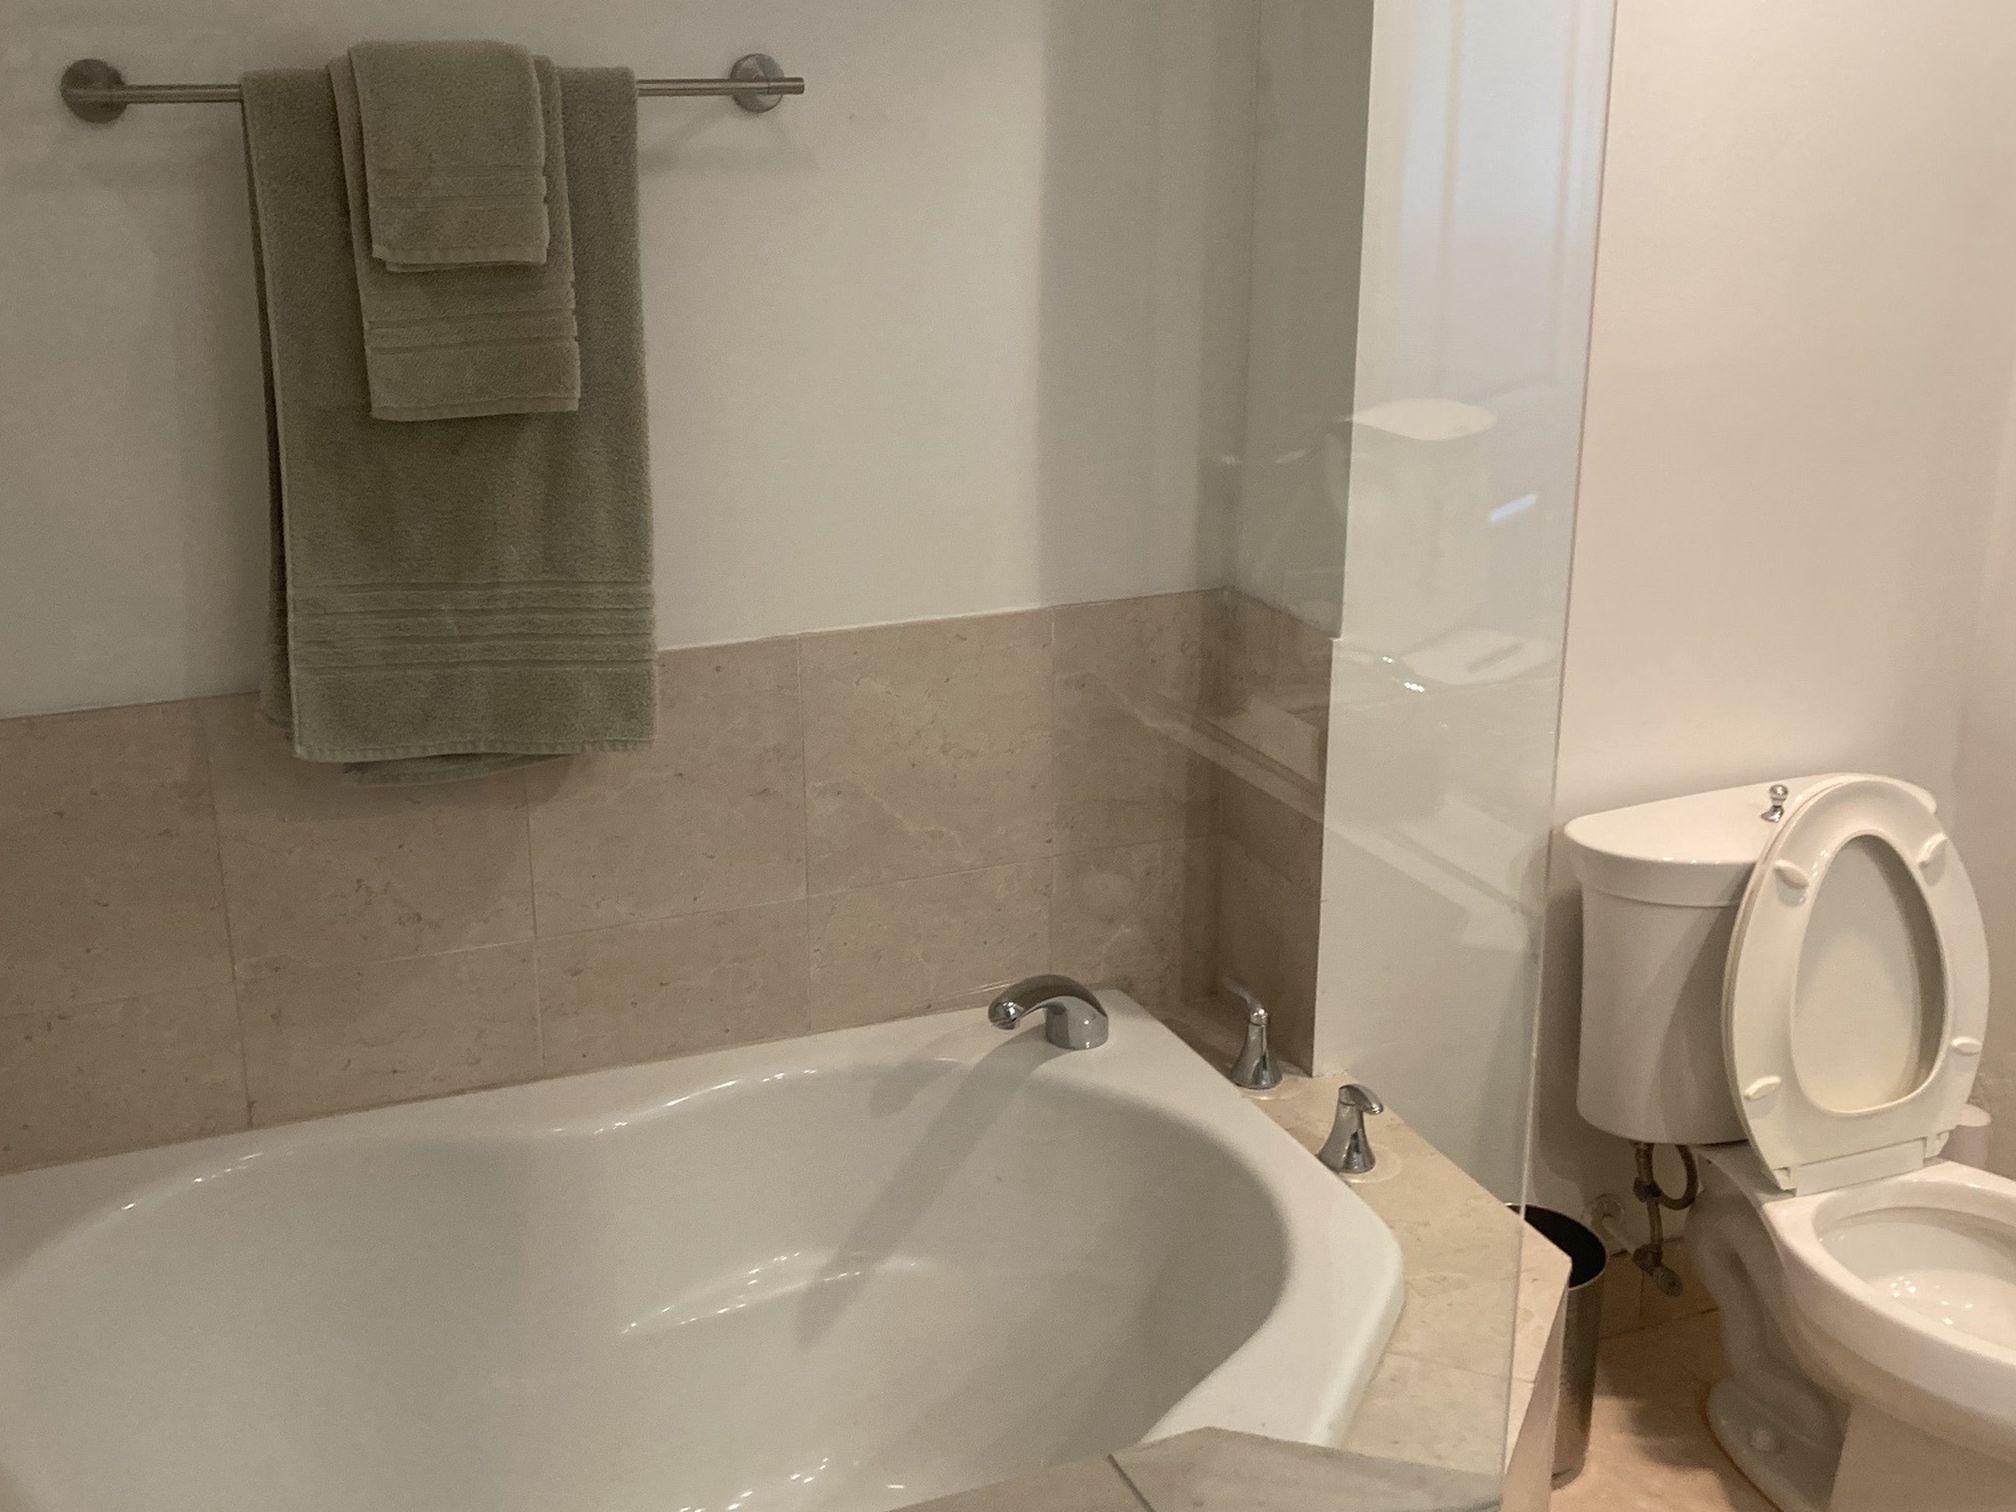 White Kohler drop in bathtub non-jetted.